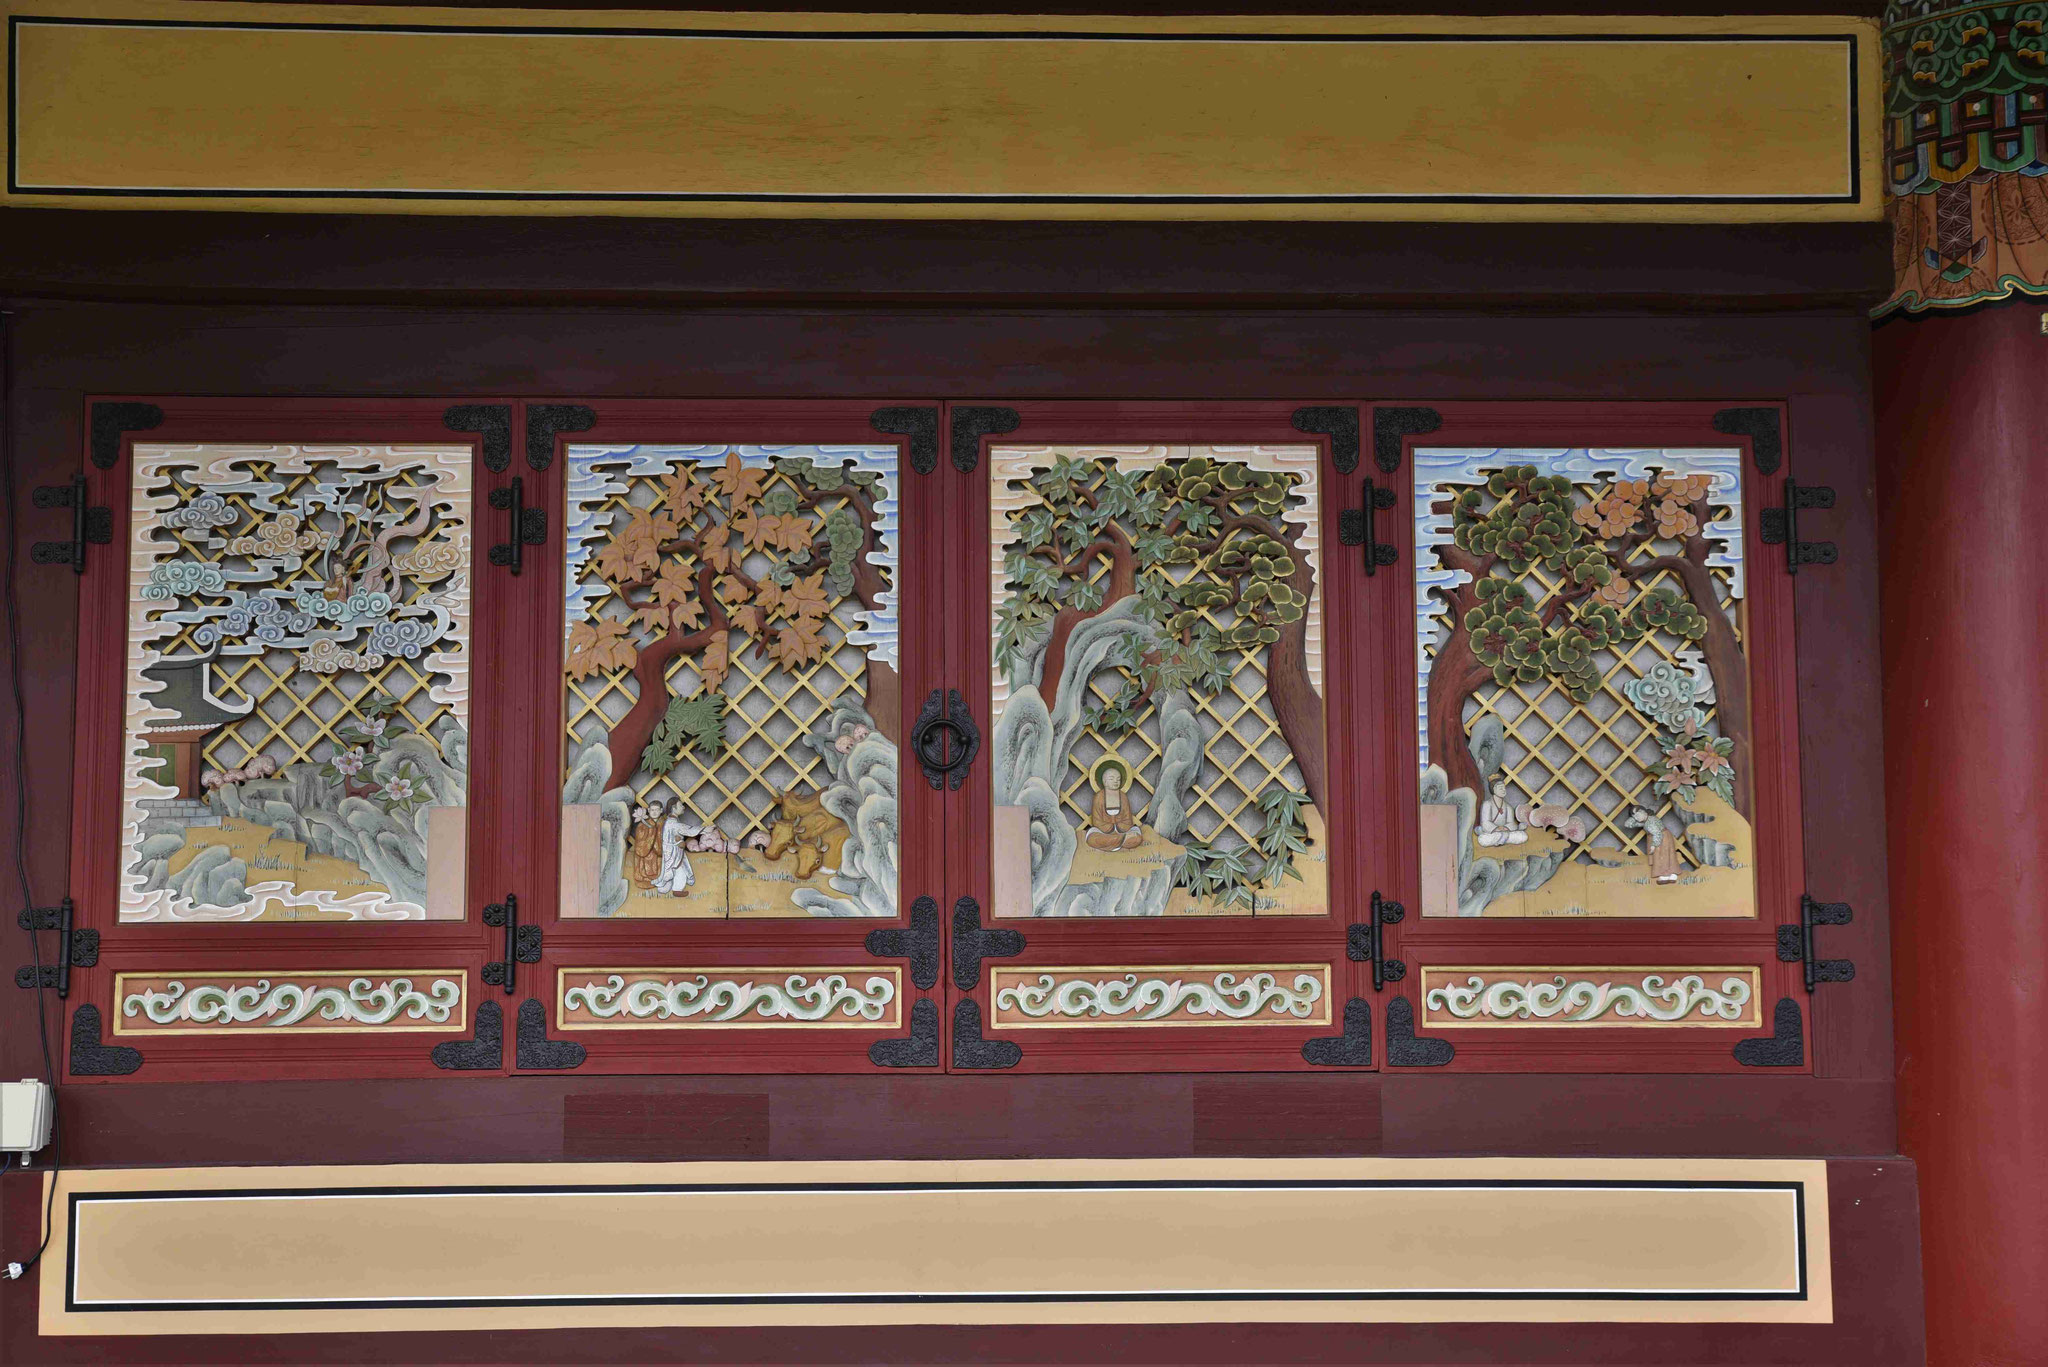 Bebilderte Geschichten an der Außenfassade